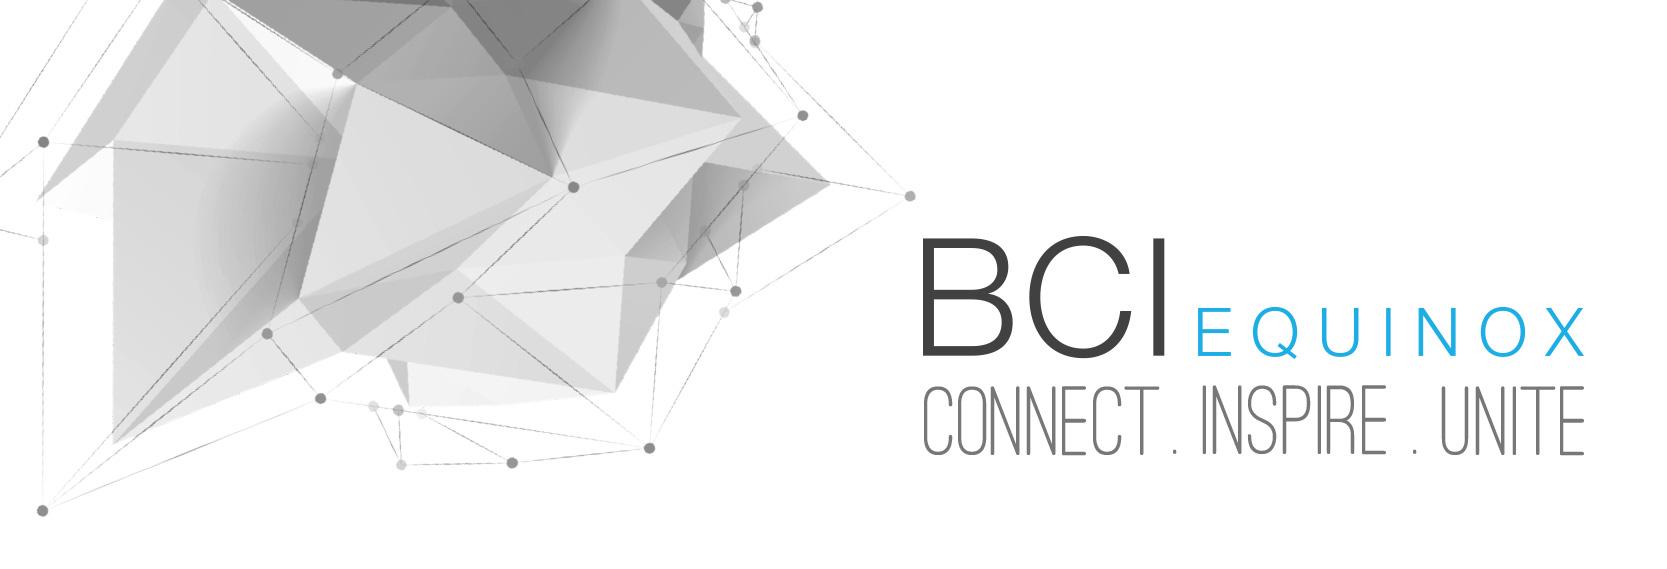 BCI Equinox